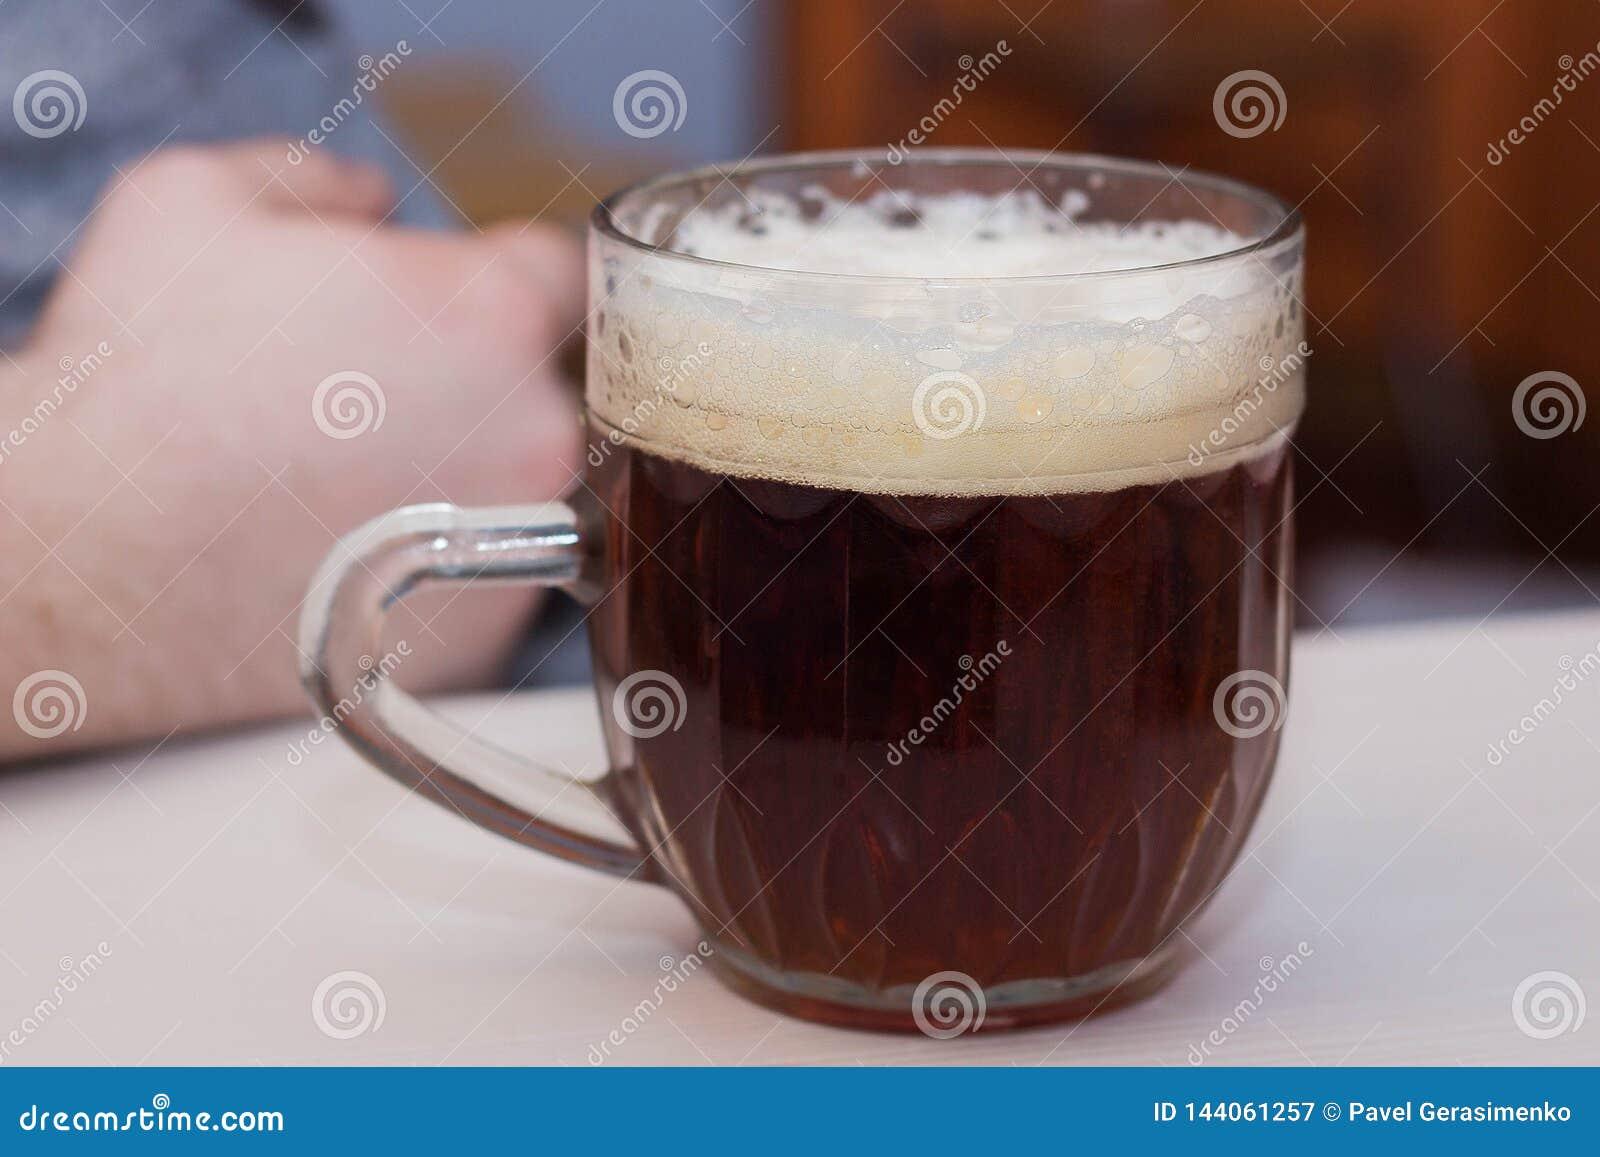 Glas dunkles Bier, gesalzene Erdnüsse